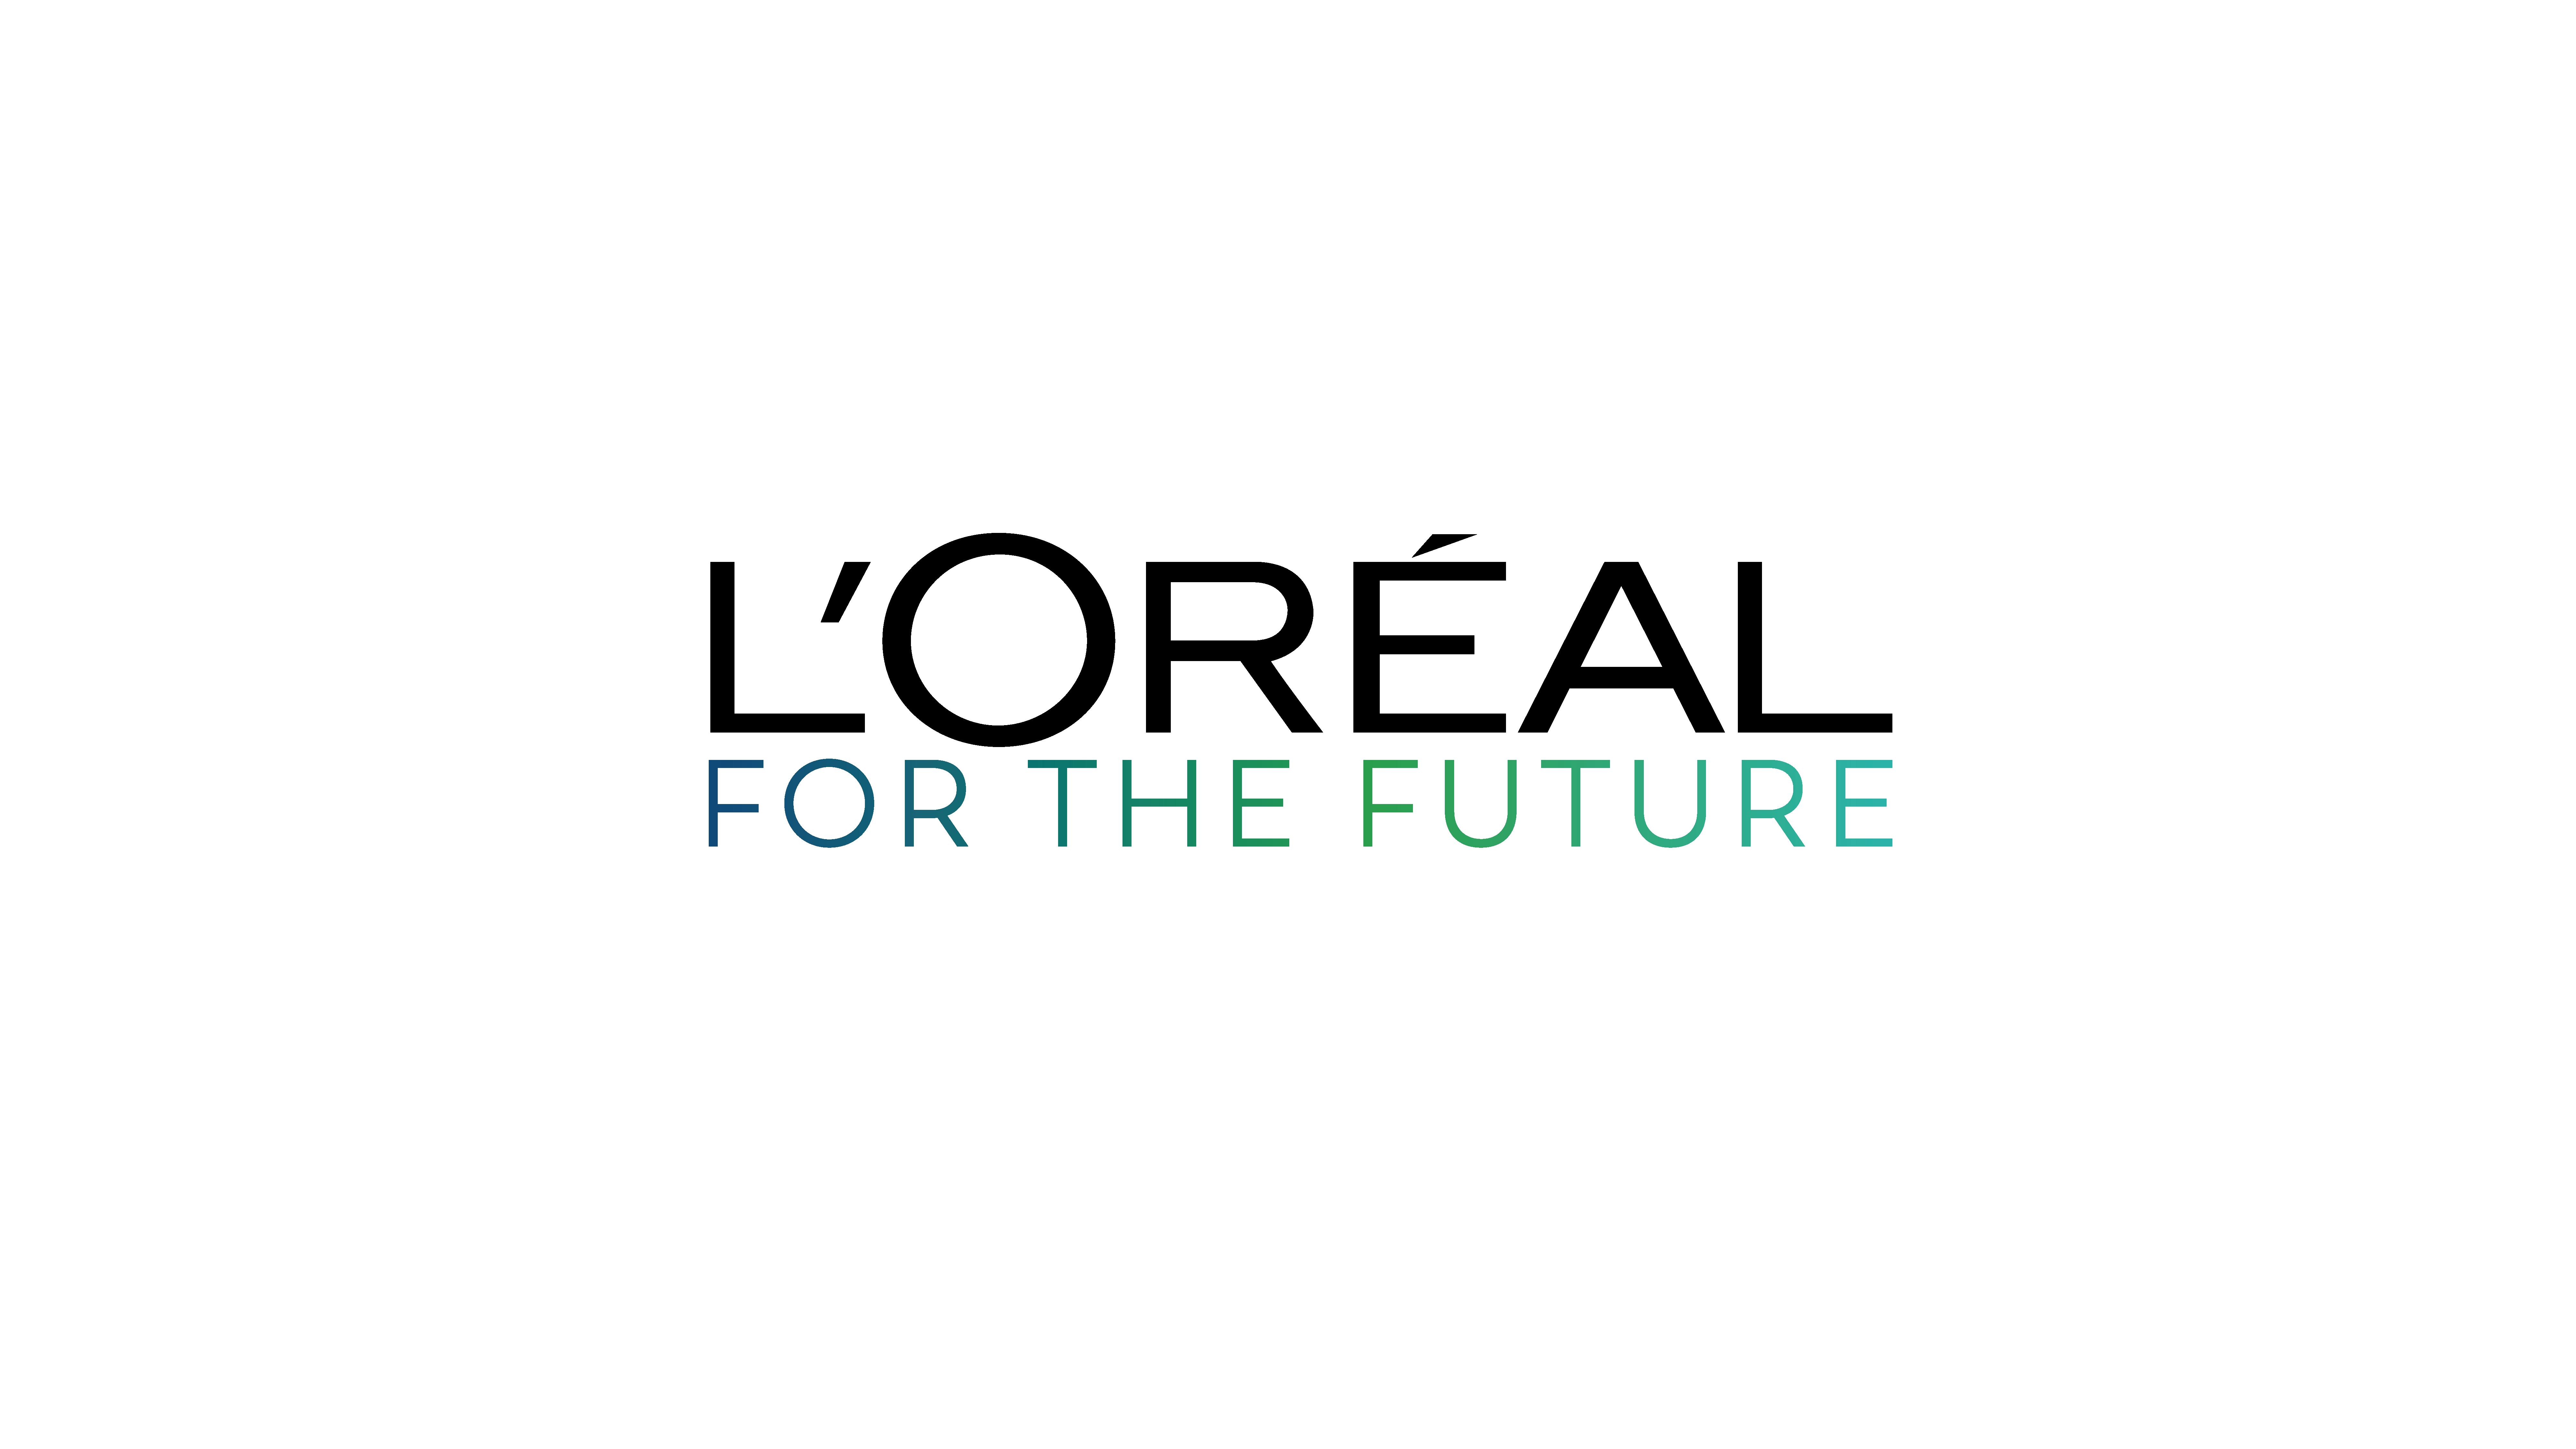 LOGO LOREAL FOR THE FUTURE